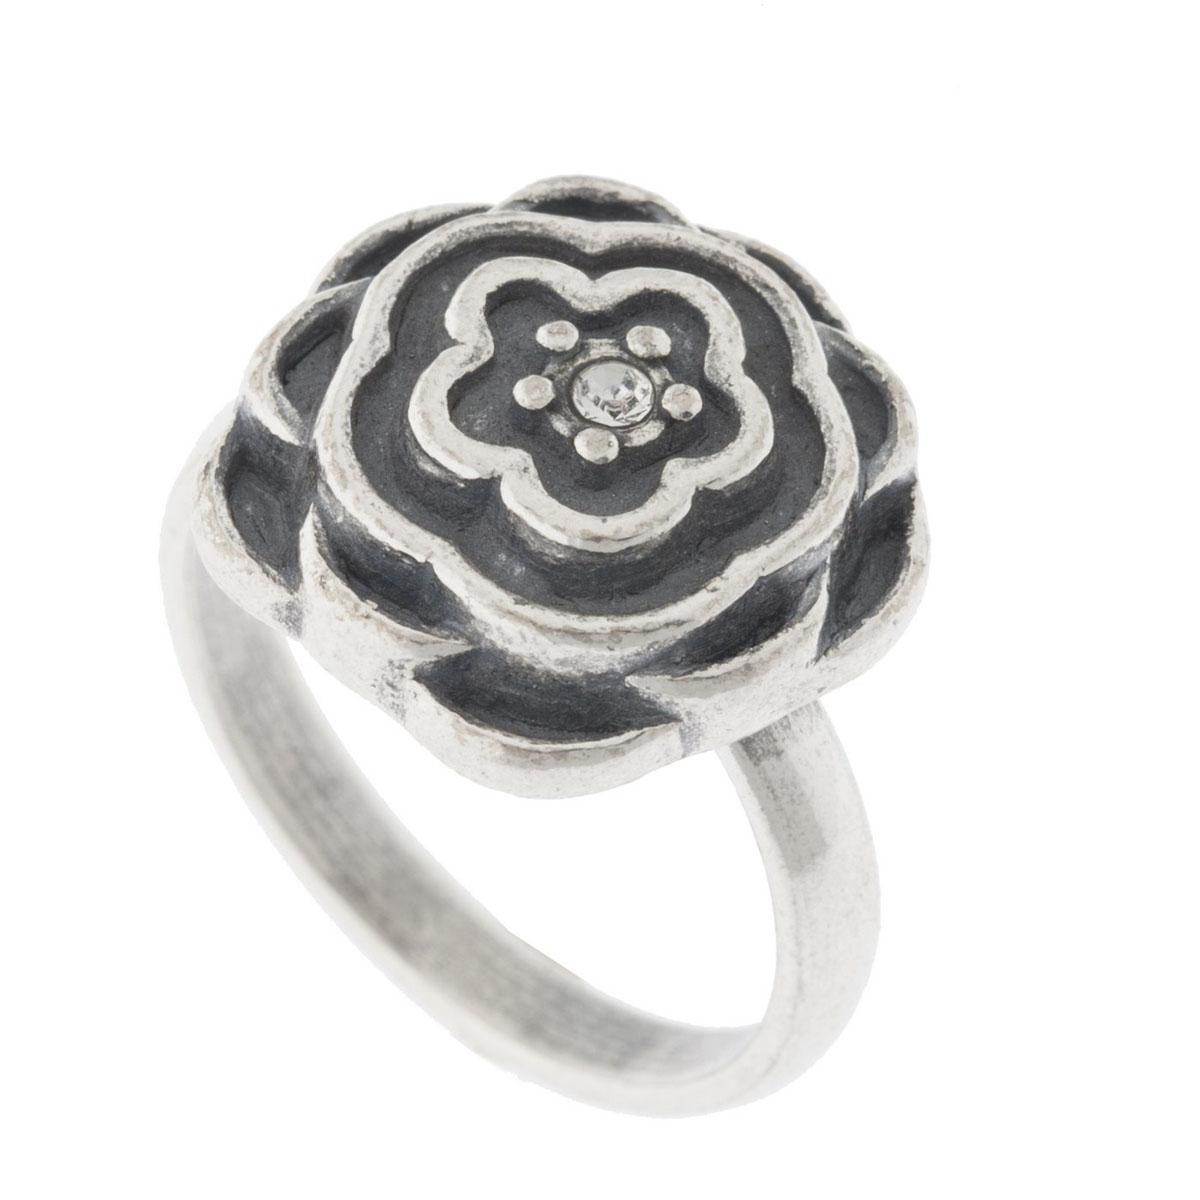 Кольцо Jenavi Рэта, цвет: серебро, белый. K5273000. Размер 18k5273000Коллекция Jetta, Рэта (Кольцо) гипоаллергенный ювелирный сплав,Черненое серебро, вставка Кристаллы Swarovski